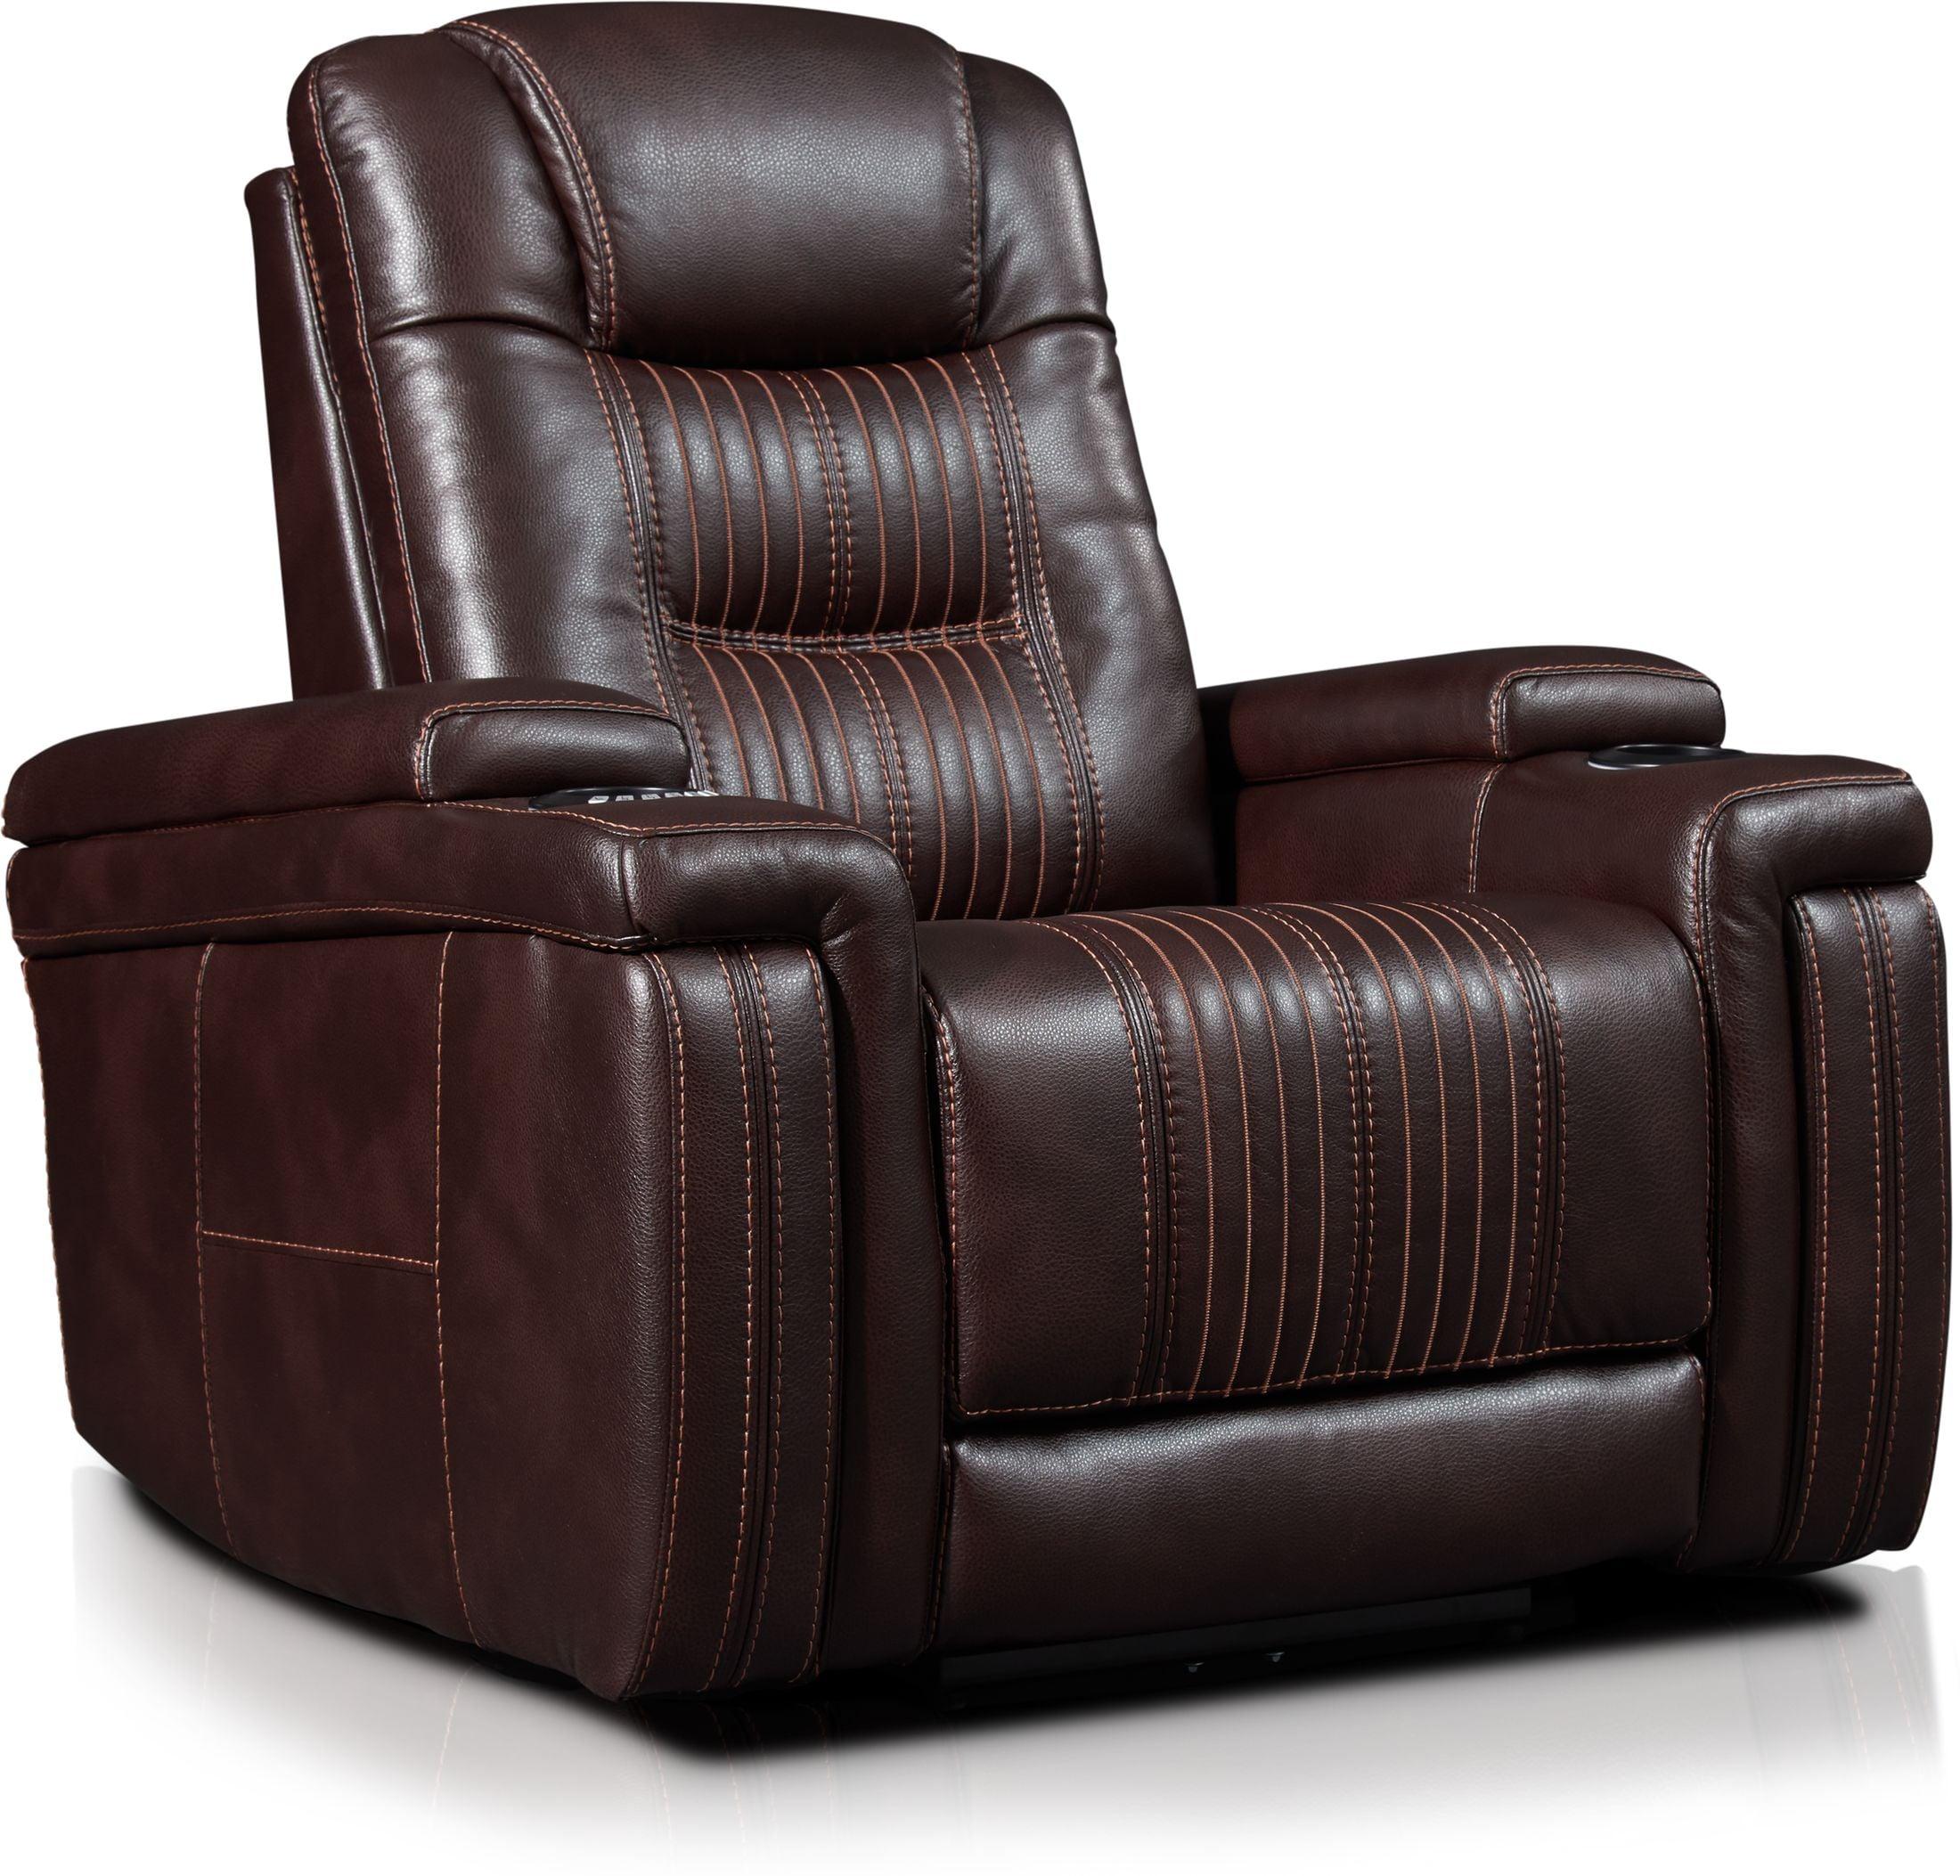 Living Room Furniture - Magnus Triple-Power Recliner - Brown